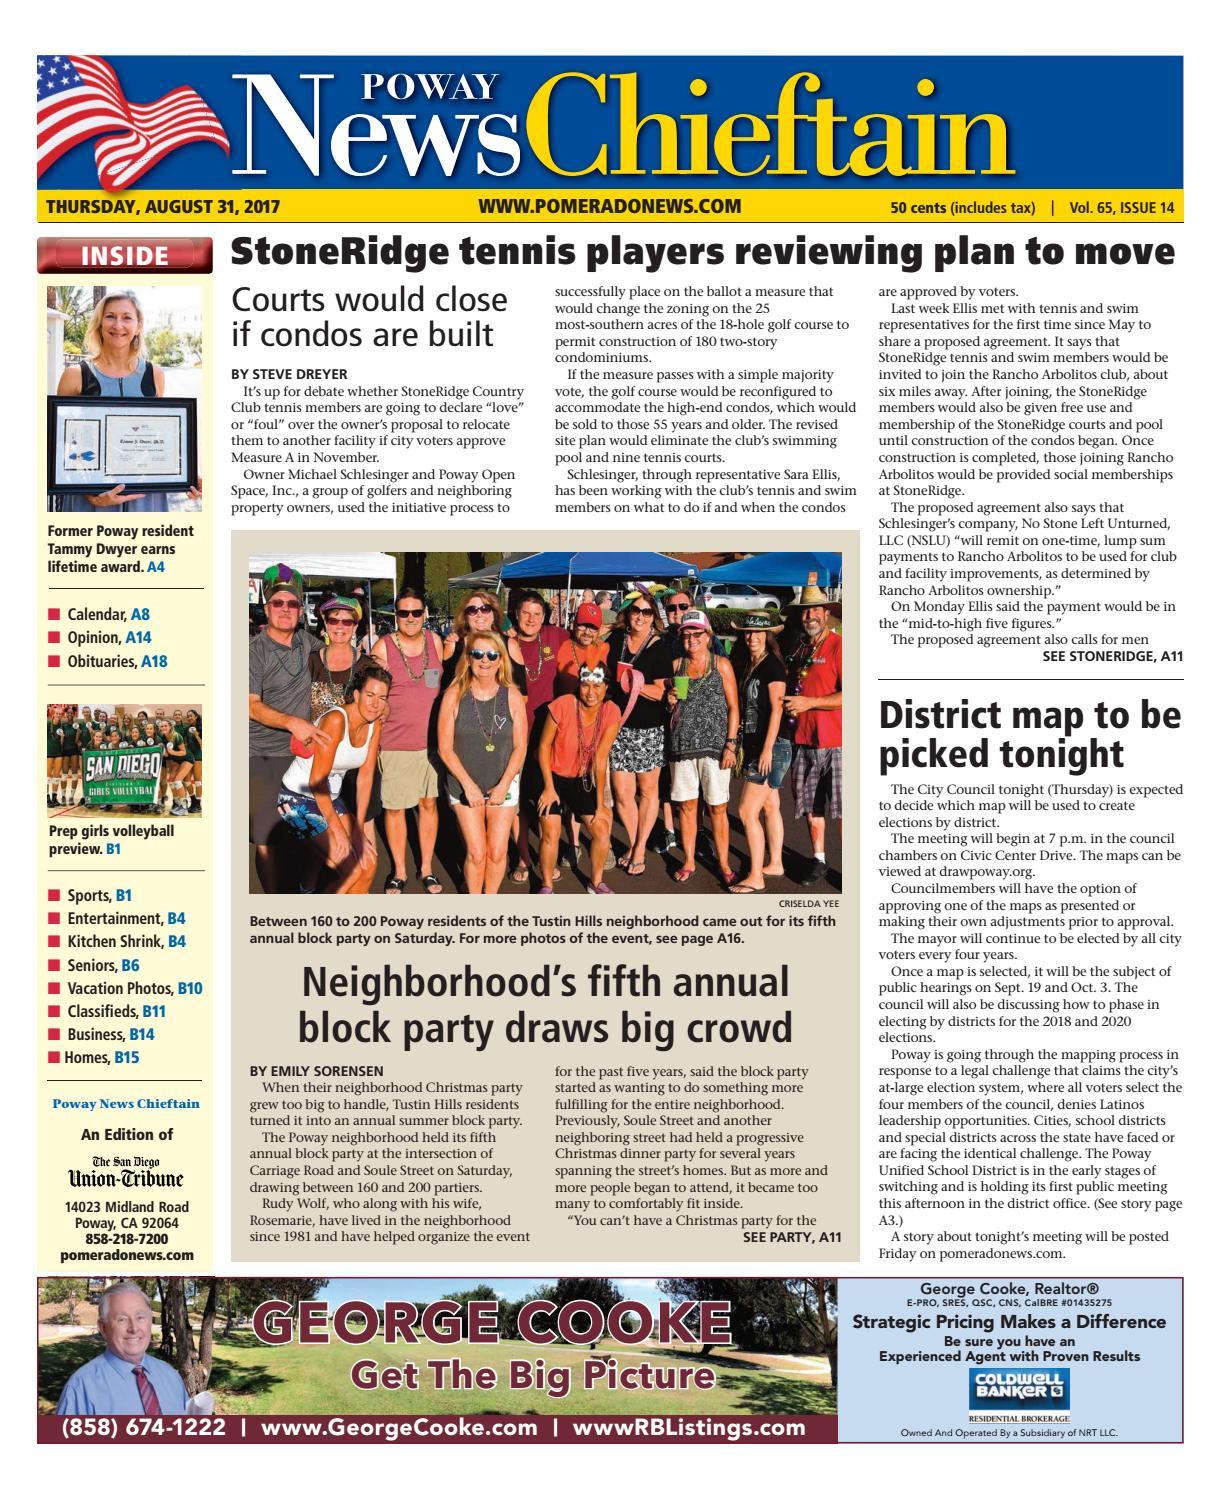 Poway News Chieftain 08 31 17 by MainStreet Media - issuu